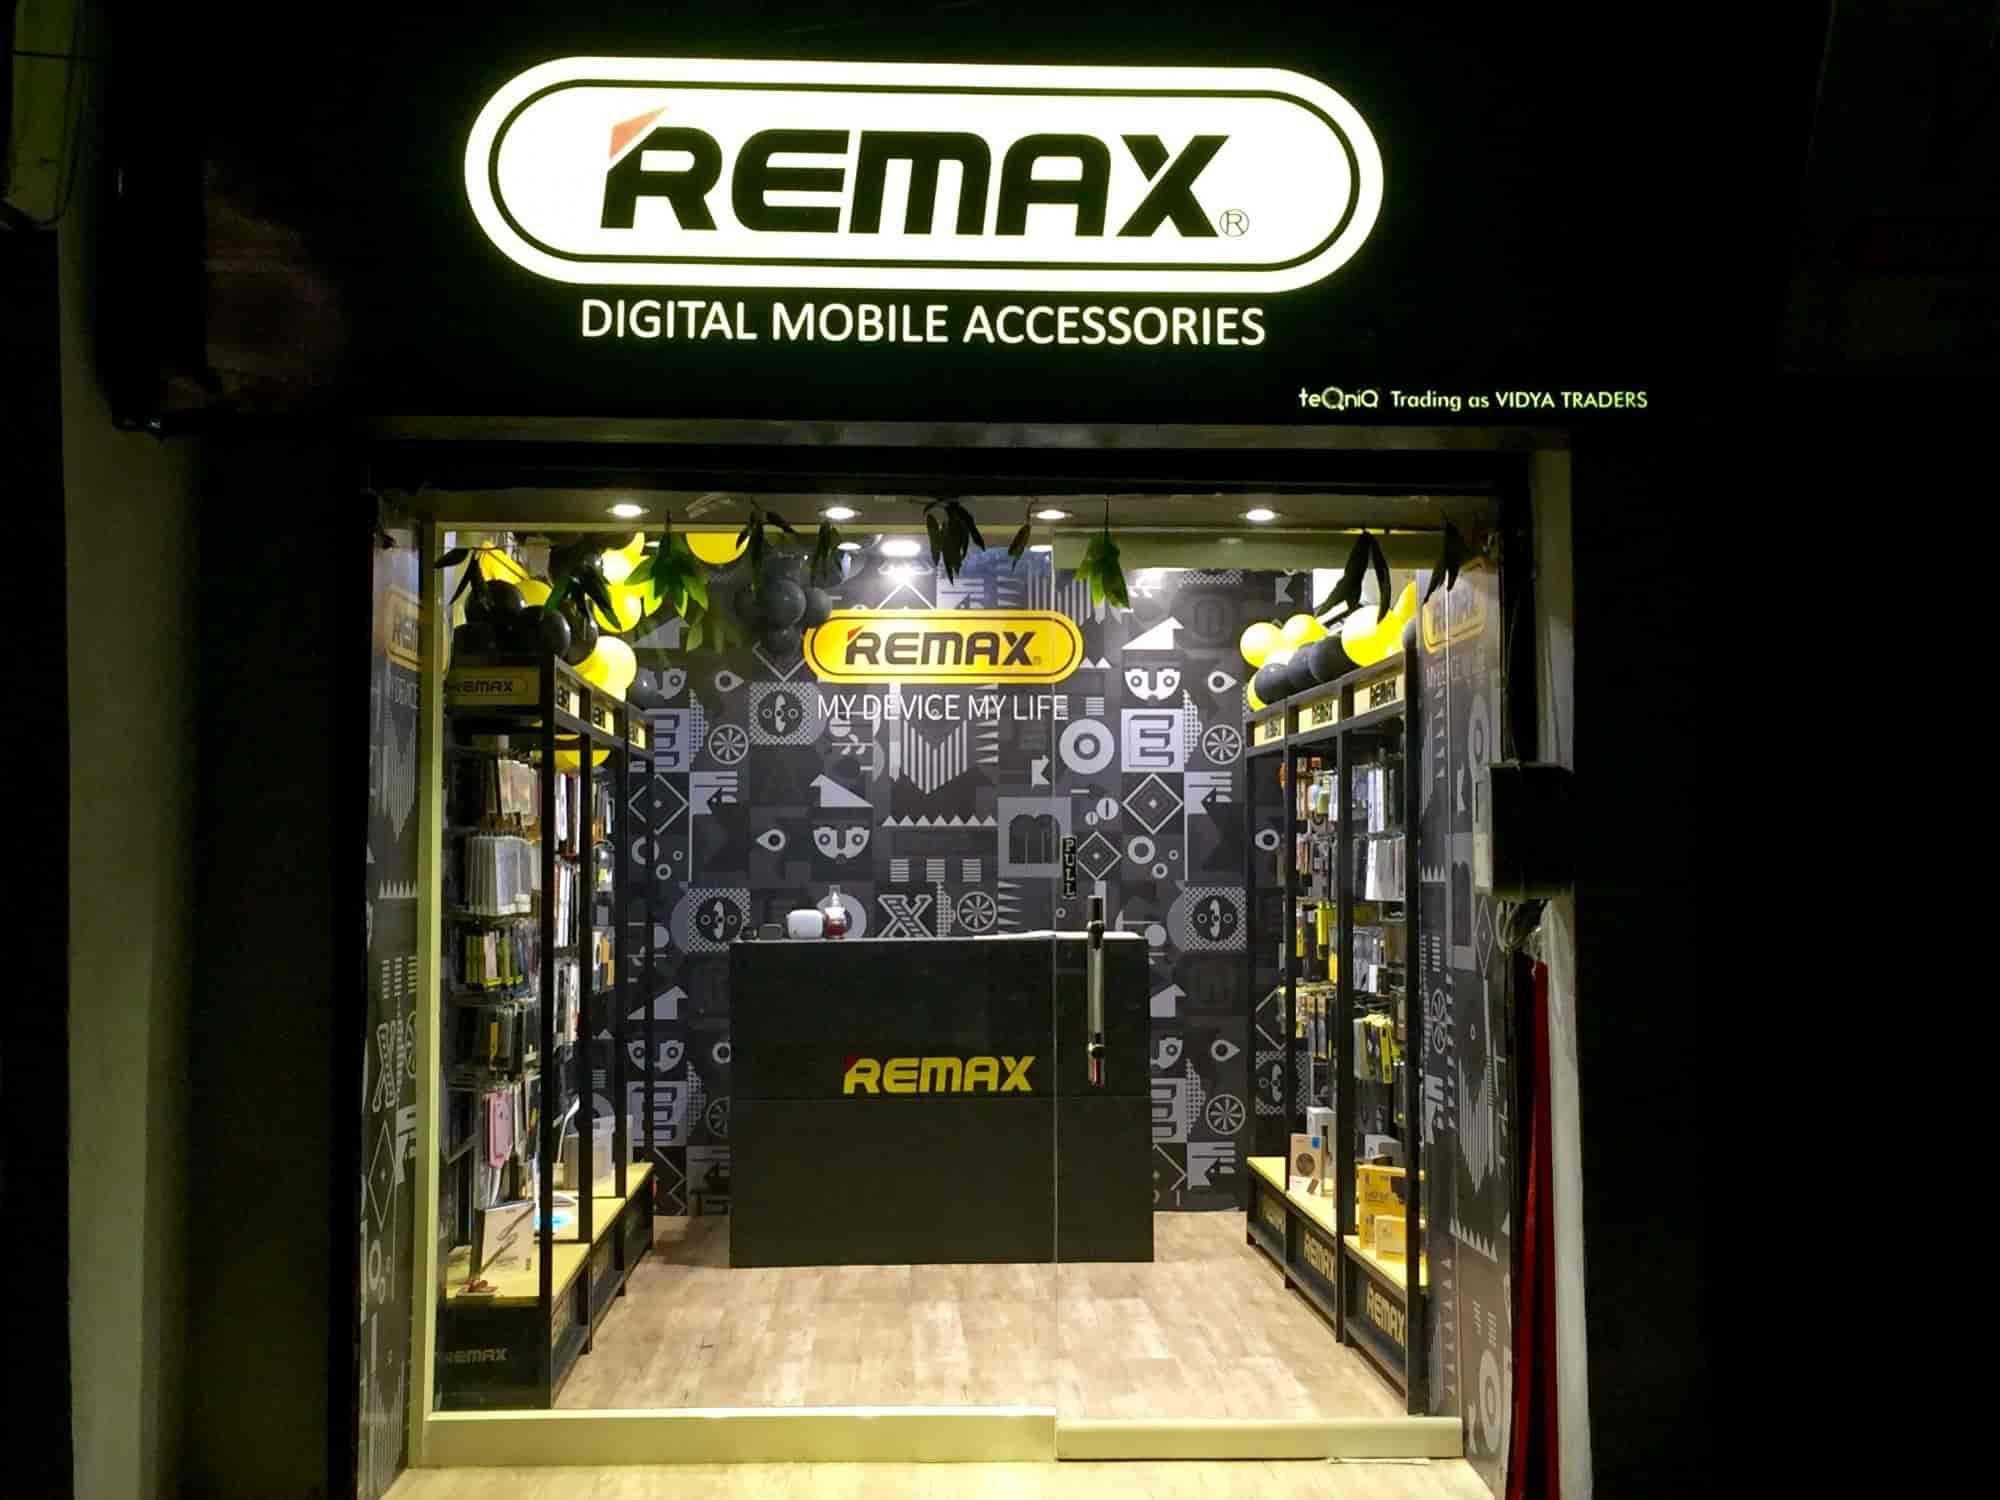 Remax Patiala Vidya Traders Photos, Patiala HO, Patiala